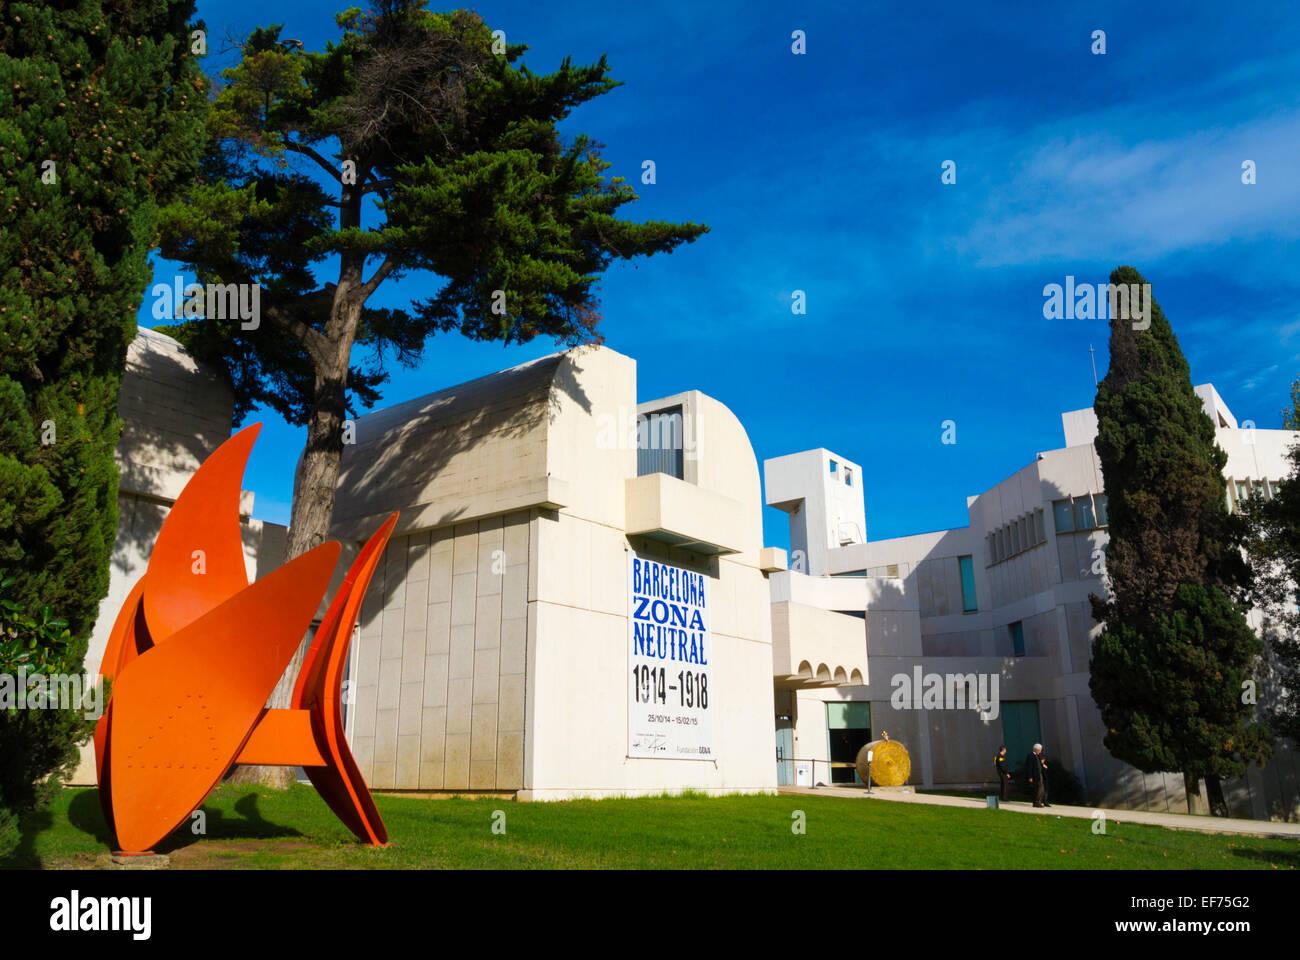 Fundacio Joan Miro, art gallery, Montjuic, Barcelona, Spain - Stock Image